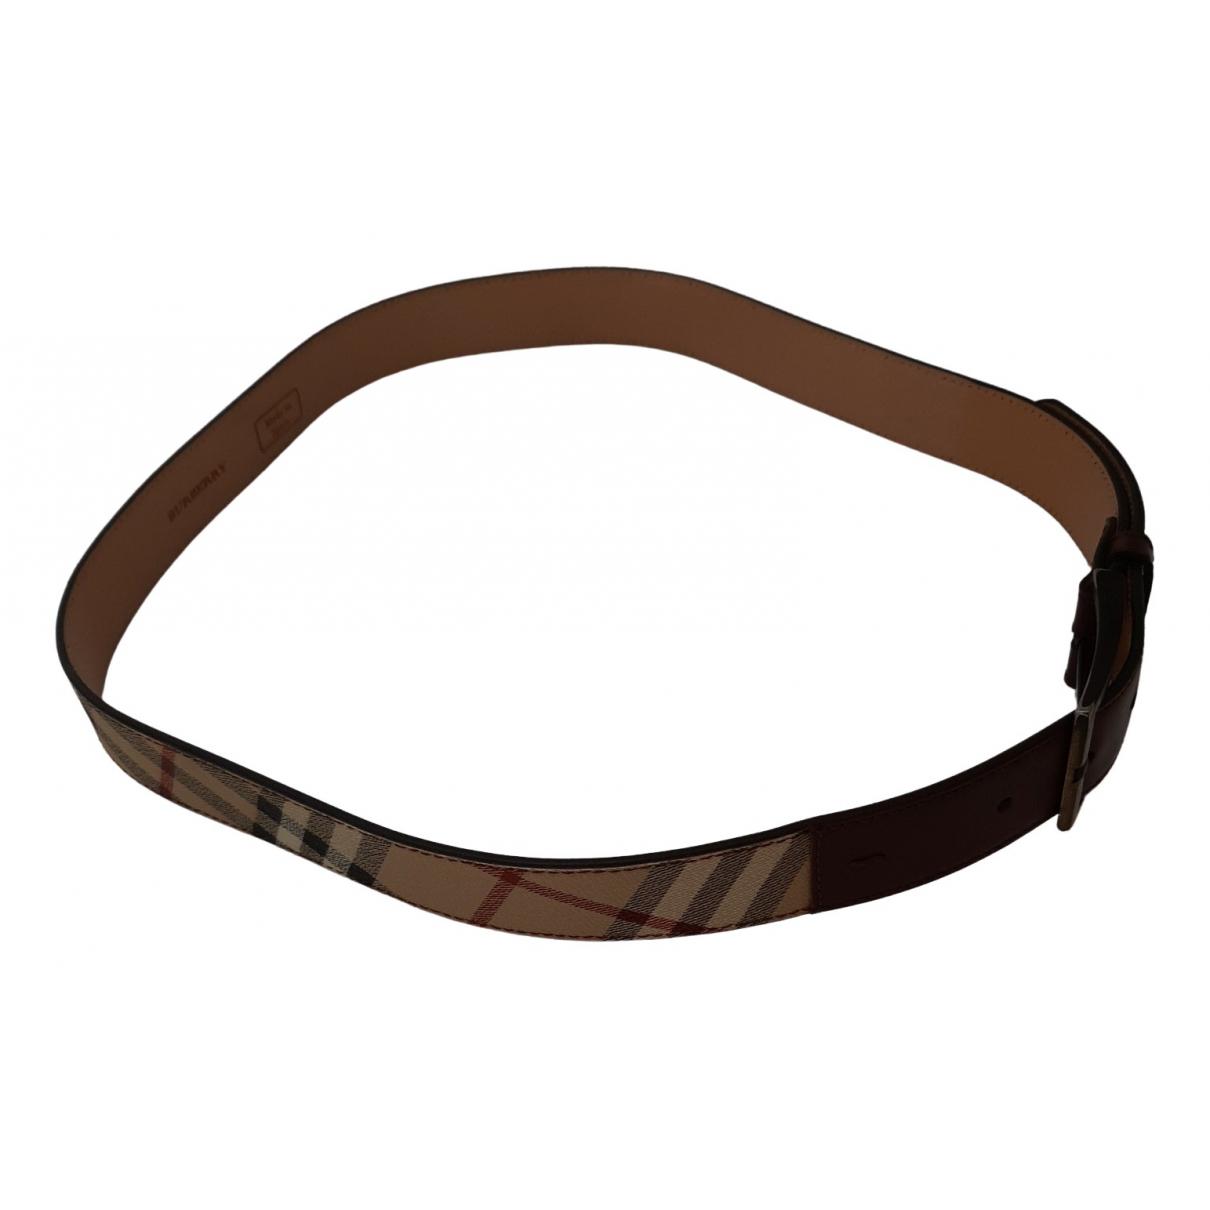 Burberry \N Beige Leather belt for Women M International